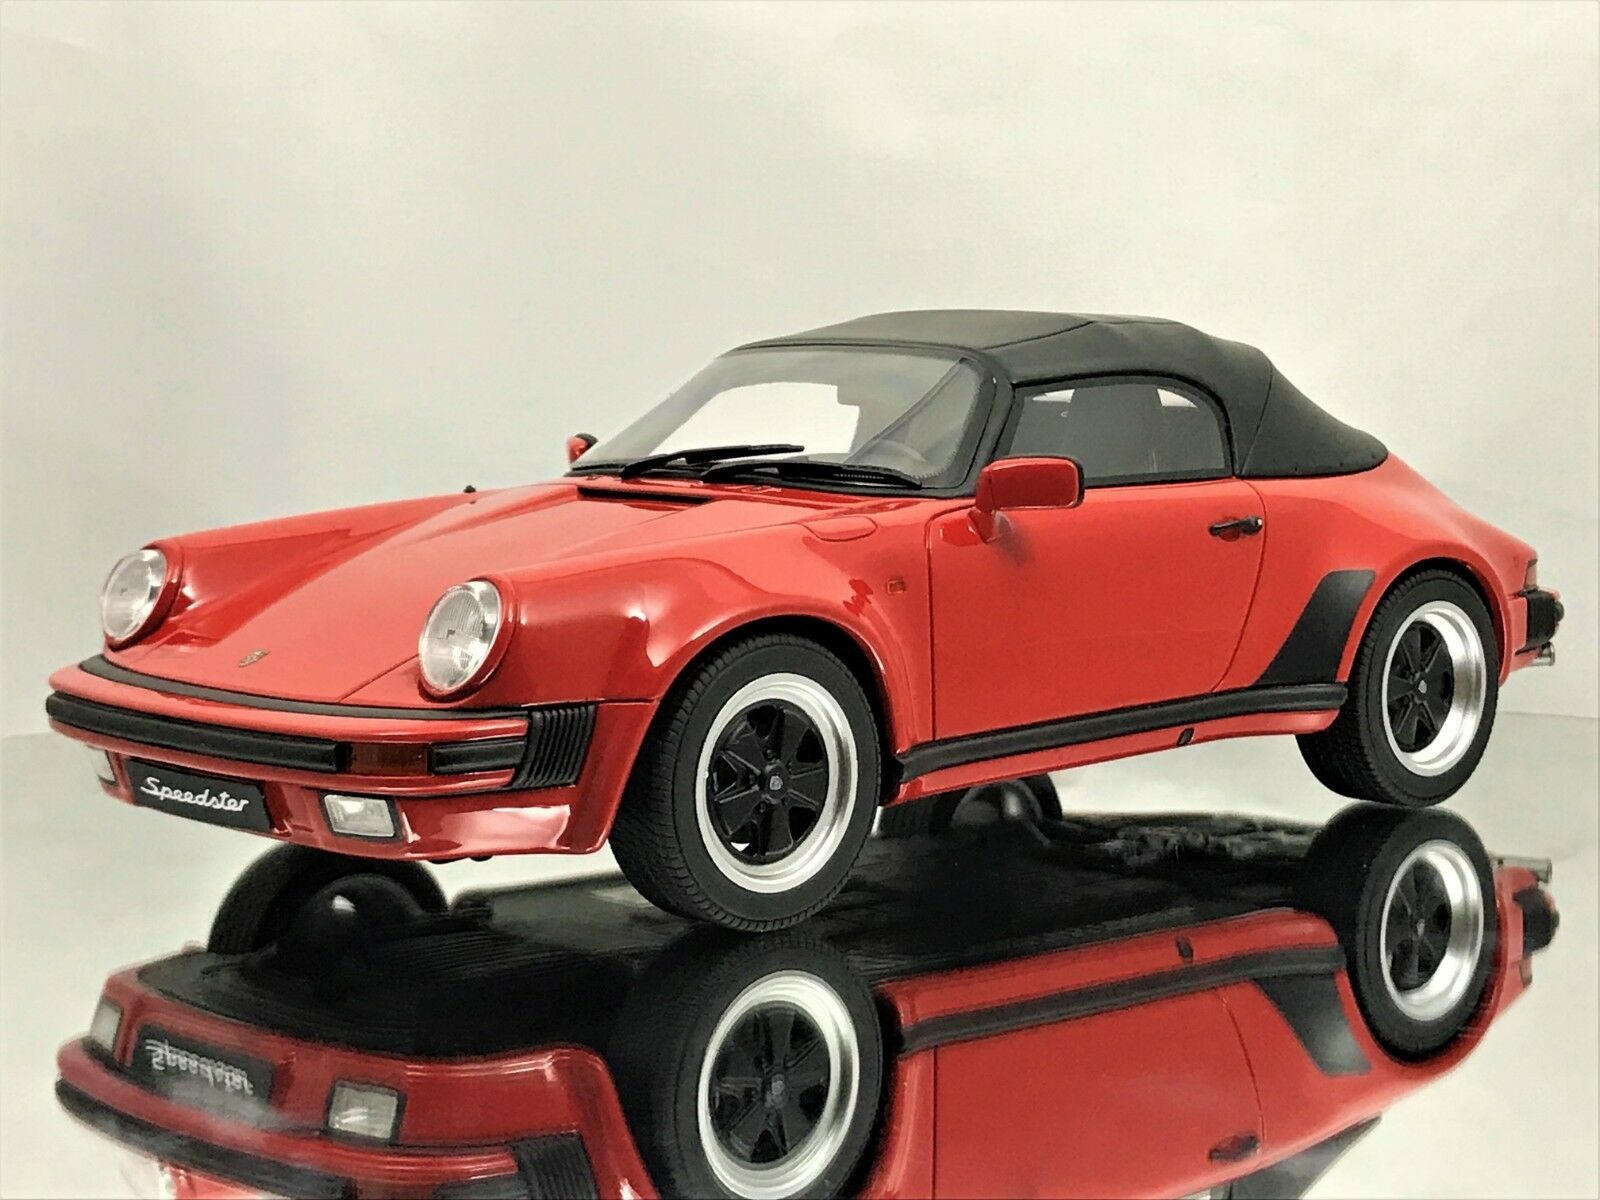 GT Spirit Porsche 911 3.2 Speedster Soft Top 1989 rosso Resin Model Car 1 18